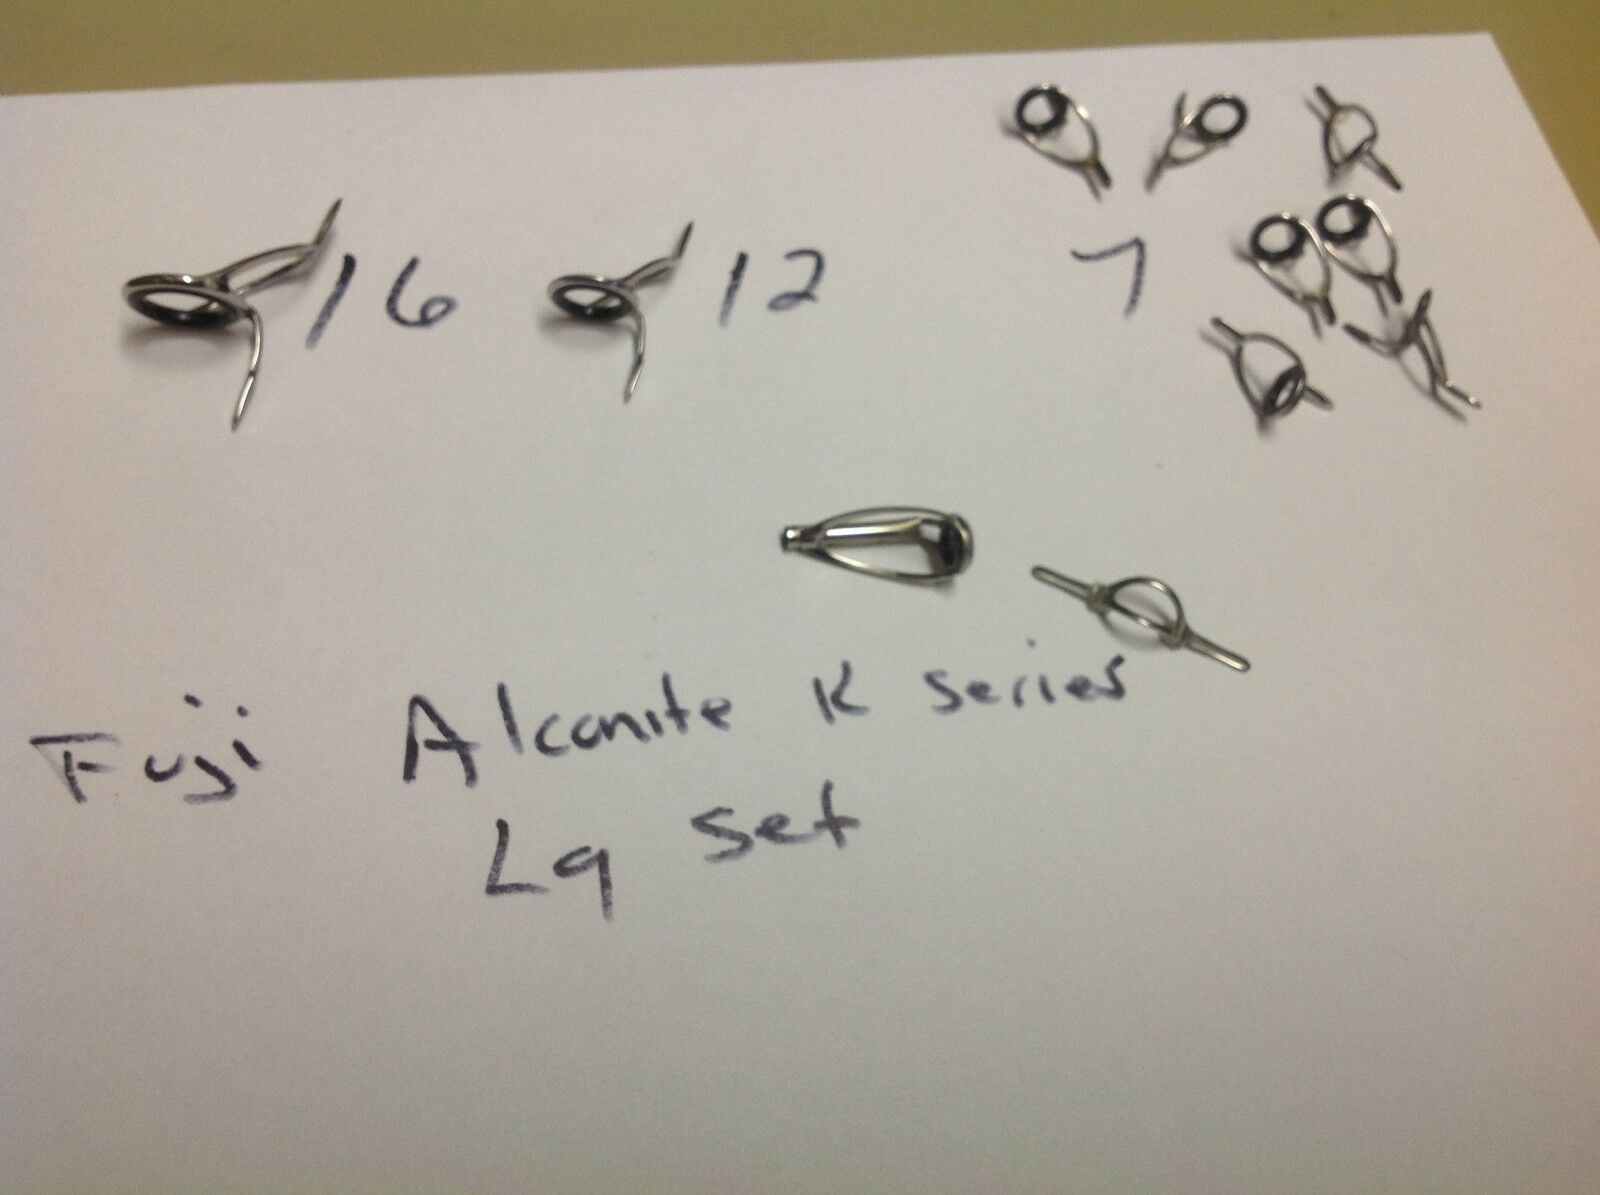 Fuji K Series alconite guides Casting Guides tangle free large set